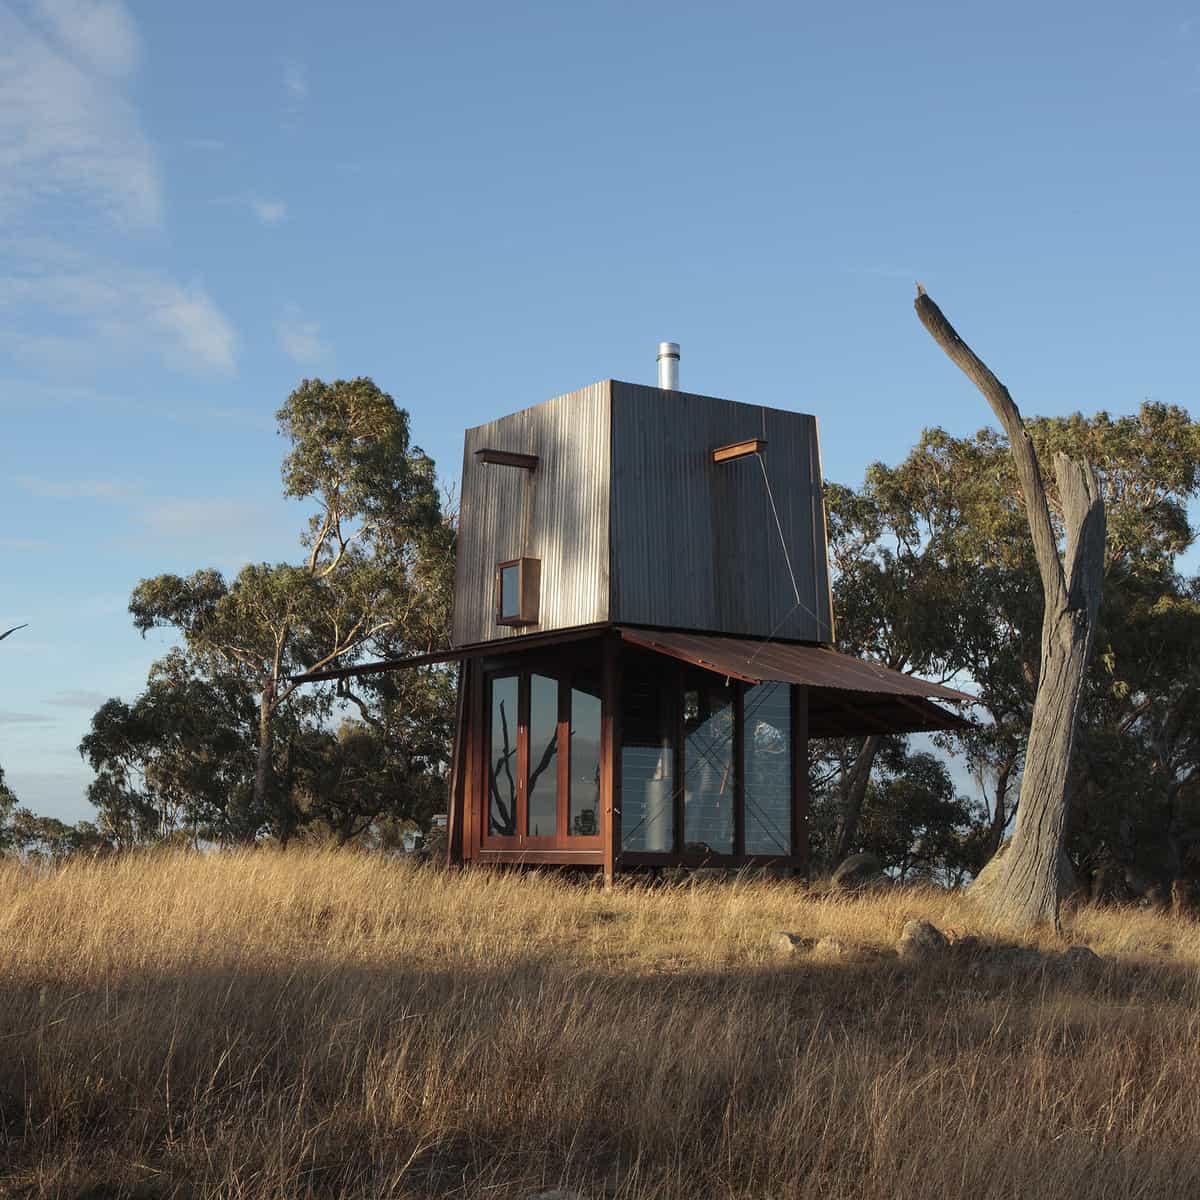 3d Design Using Home Designer Chief Architect Multi Level: 7 Clever Ideas For A Secure Remote Cabin